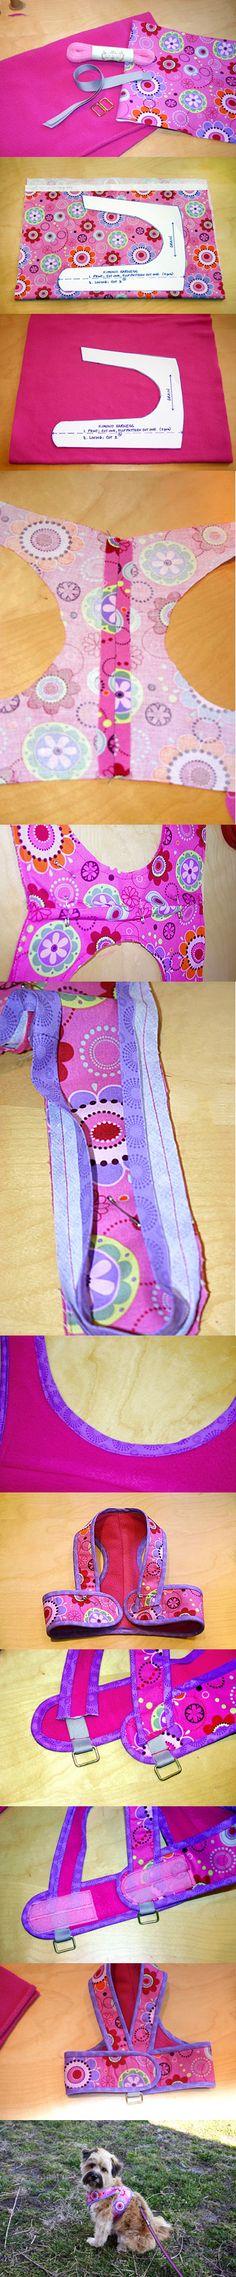 Arnés para perros. Manualidades, costura /Halter for your dog. Handmade crafts. DIY. Mediterranean Natural